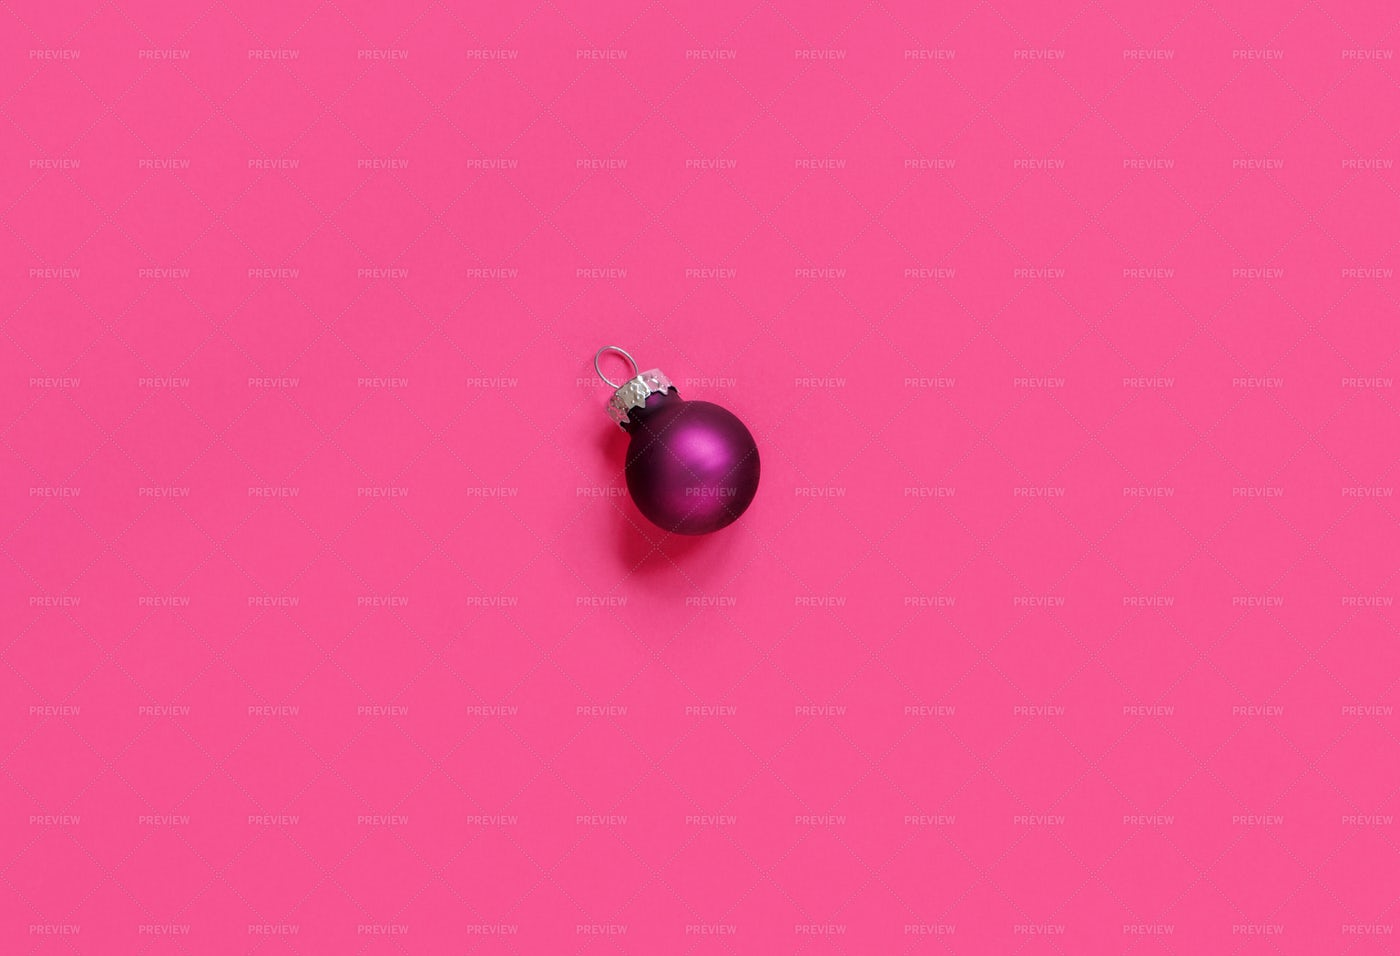 Single Purple Christmas Ornament On Pink: Stock Photos